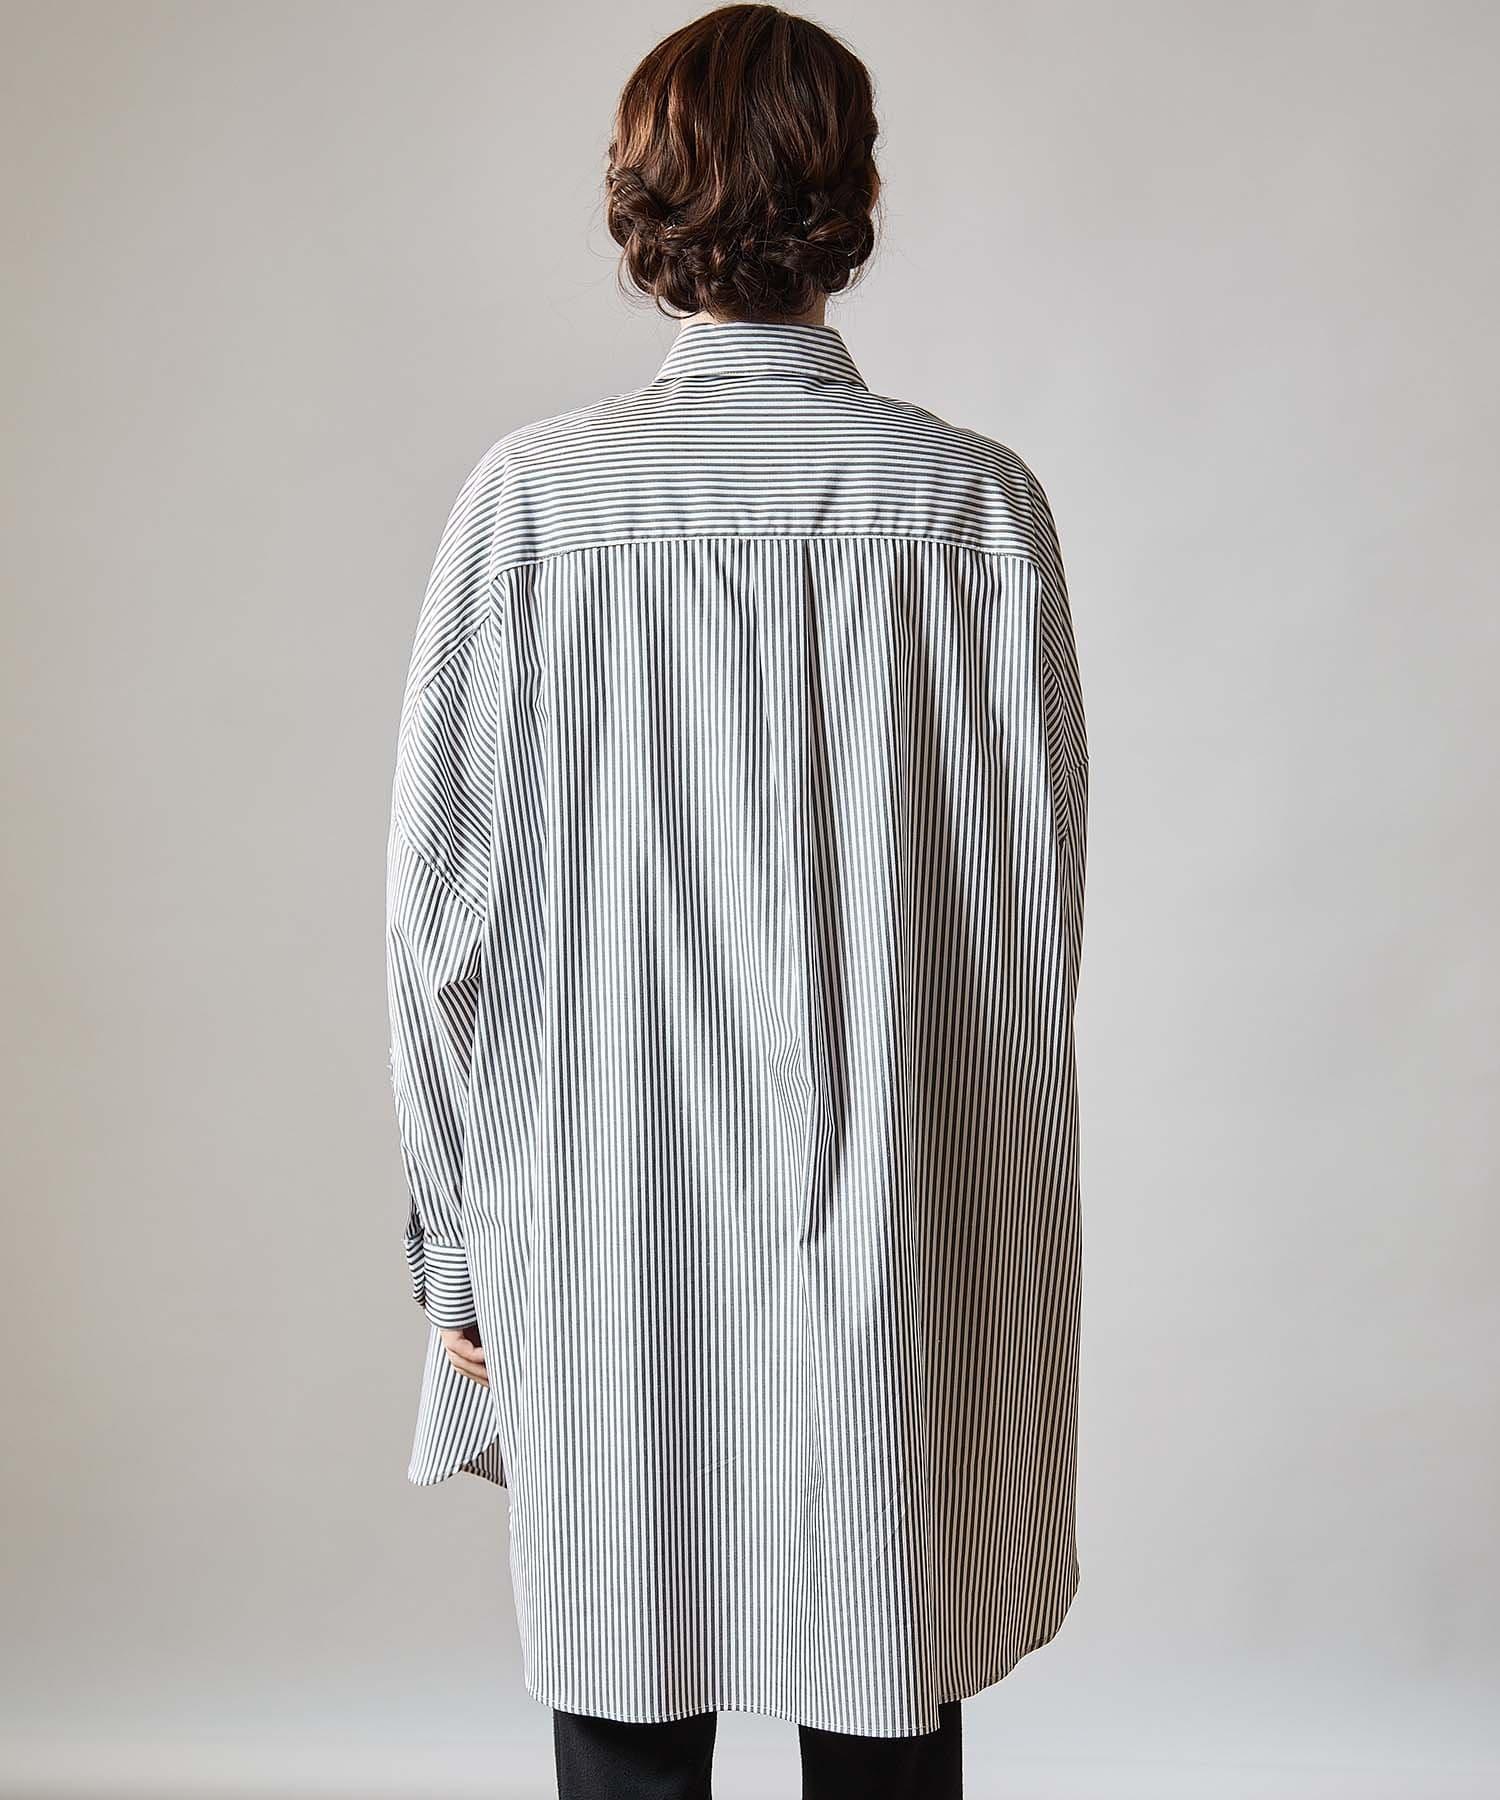 OUVRAGE CLASSE(ウヴラージュクラス) 【オンラインストア限定】ストライプビッグシャツ